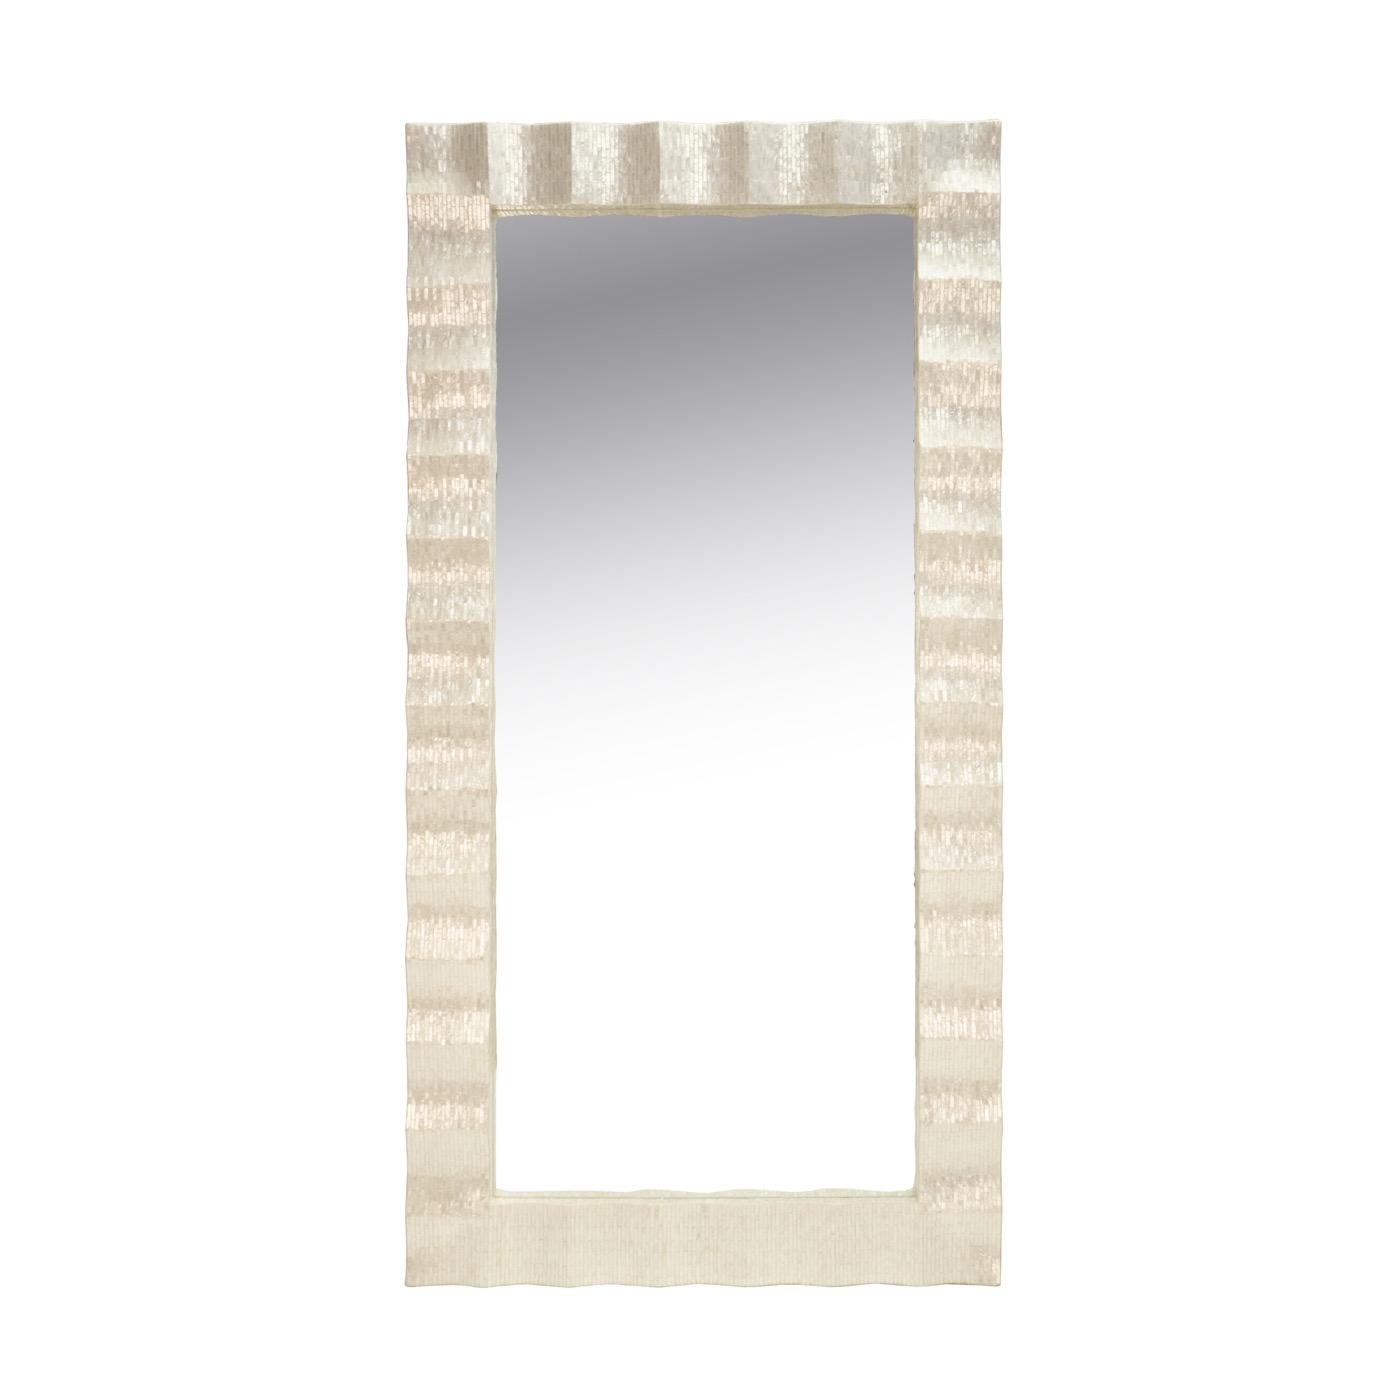 Swanson Scalloped Floor Mirror Regarding Swanson Ceramic Garden Stools (View 25 of 25)